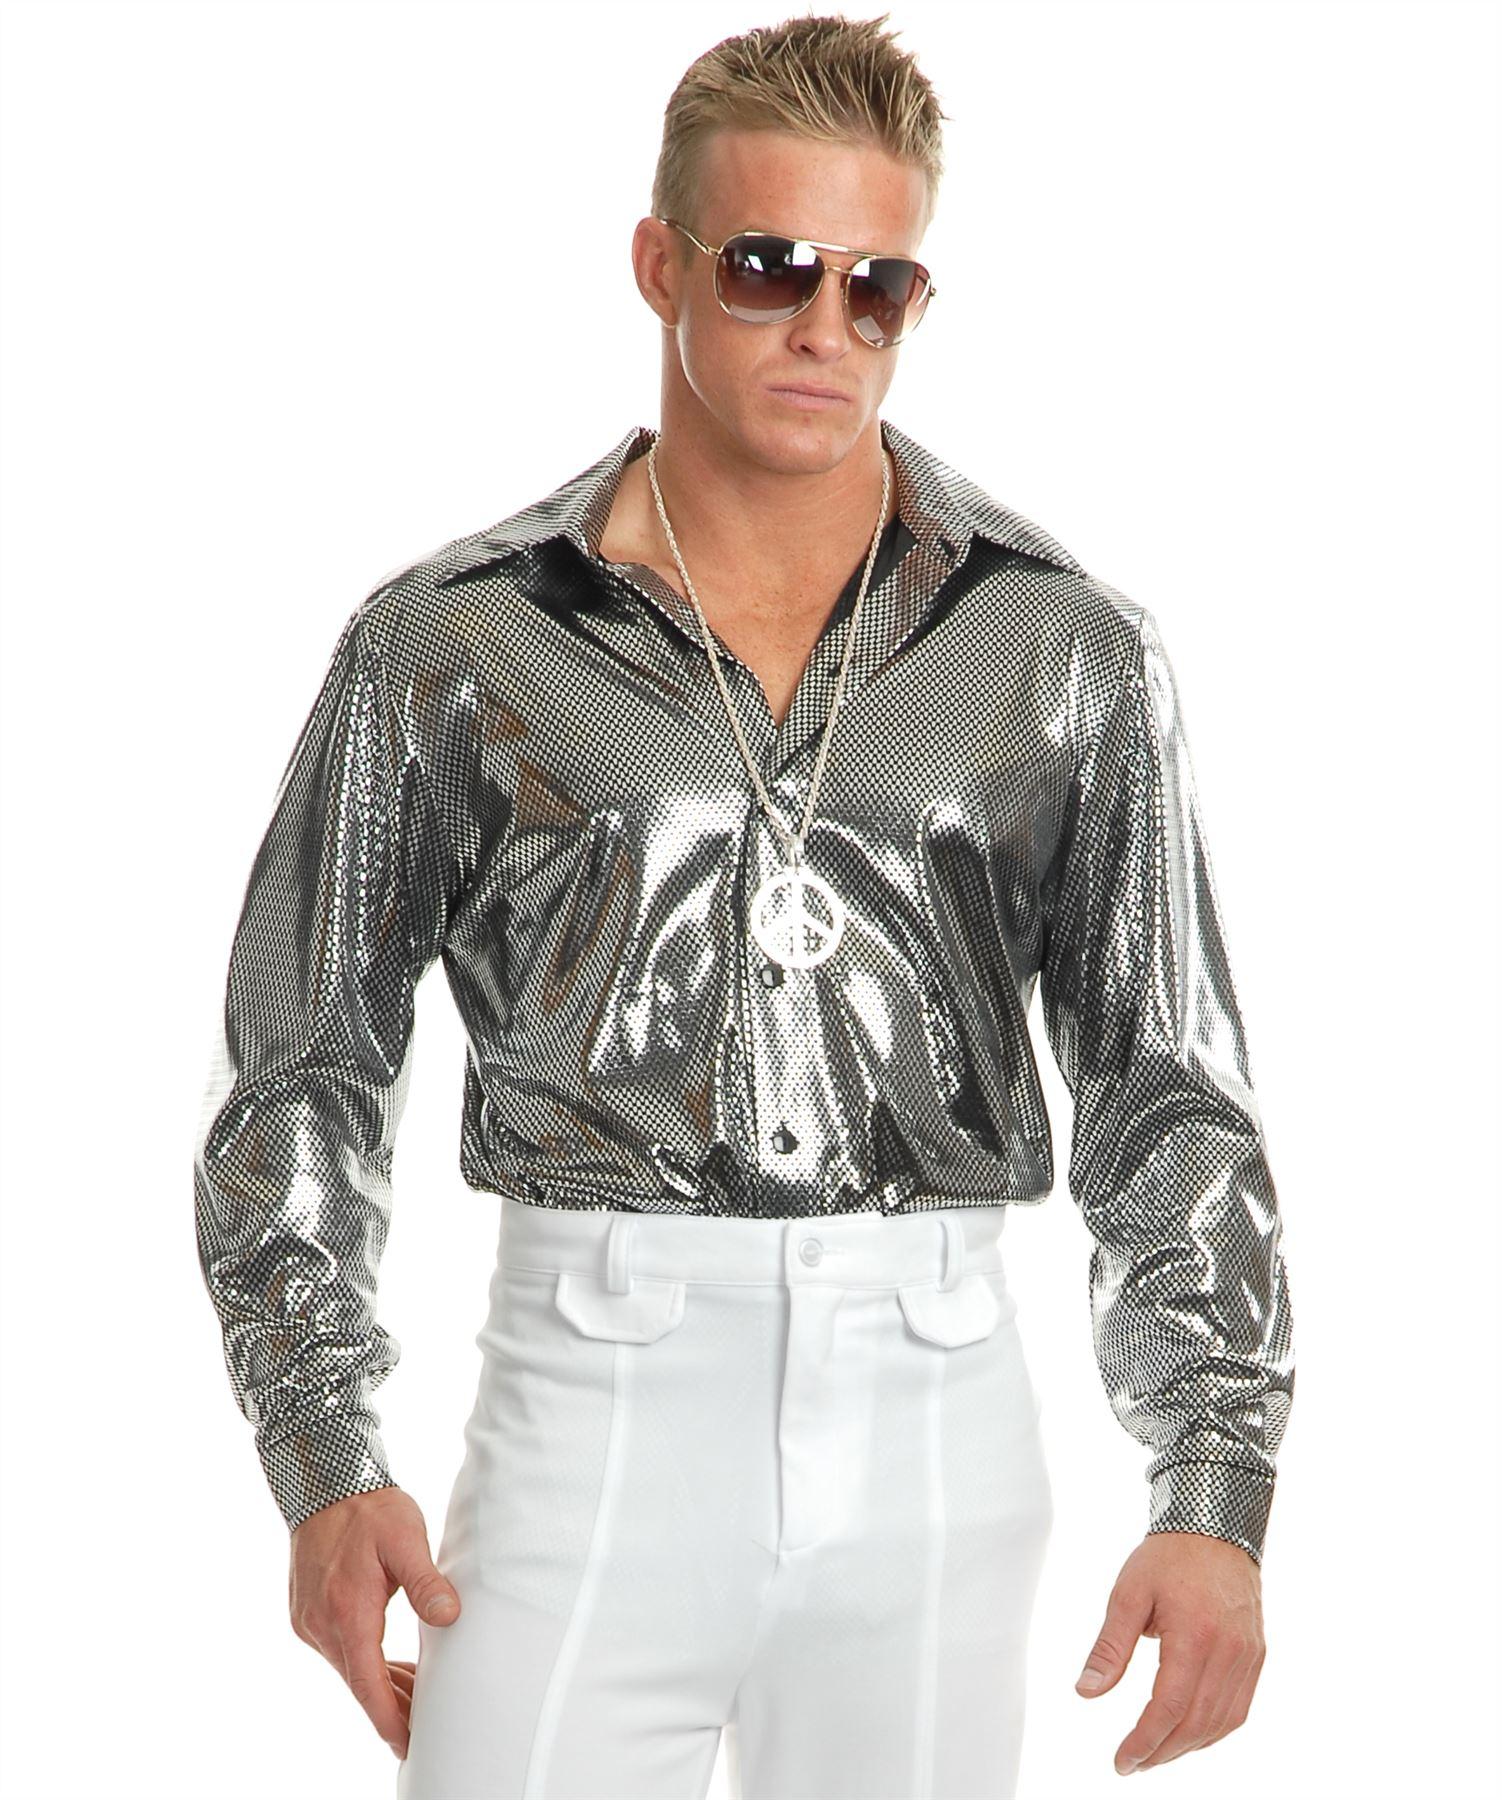 Disco Shirt Retro 70S Metallic Studio 54 Mens Halloween ...